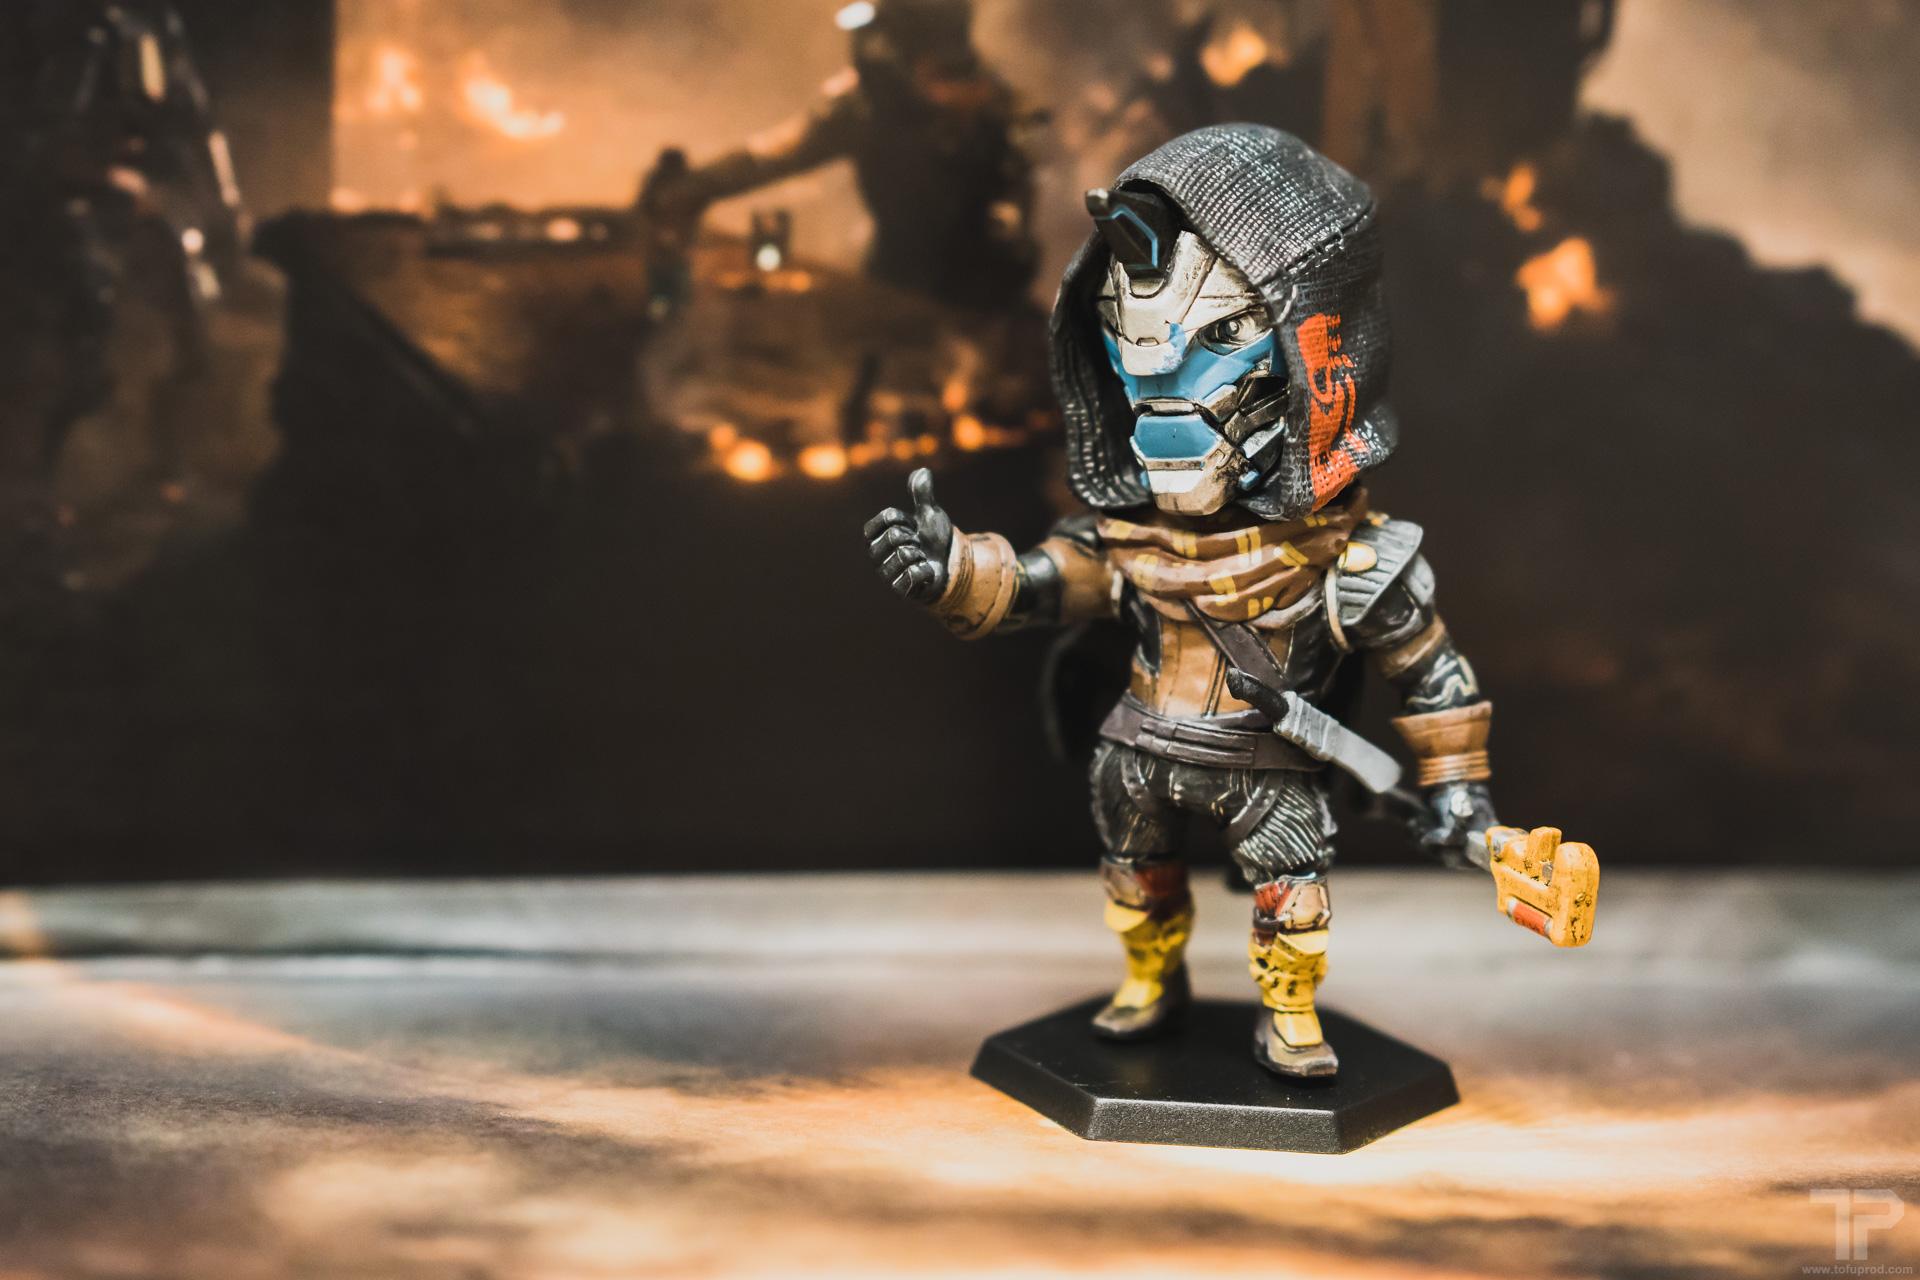 cayde-6 destiny 2 pre-order figure